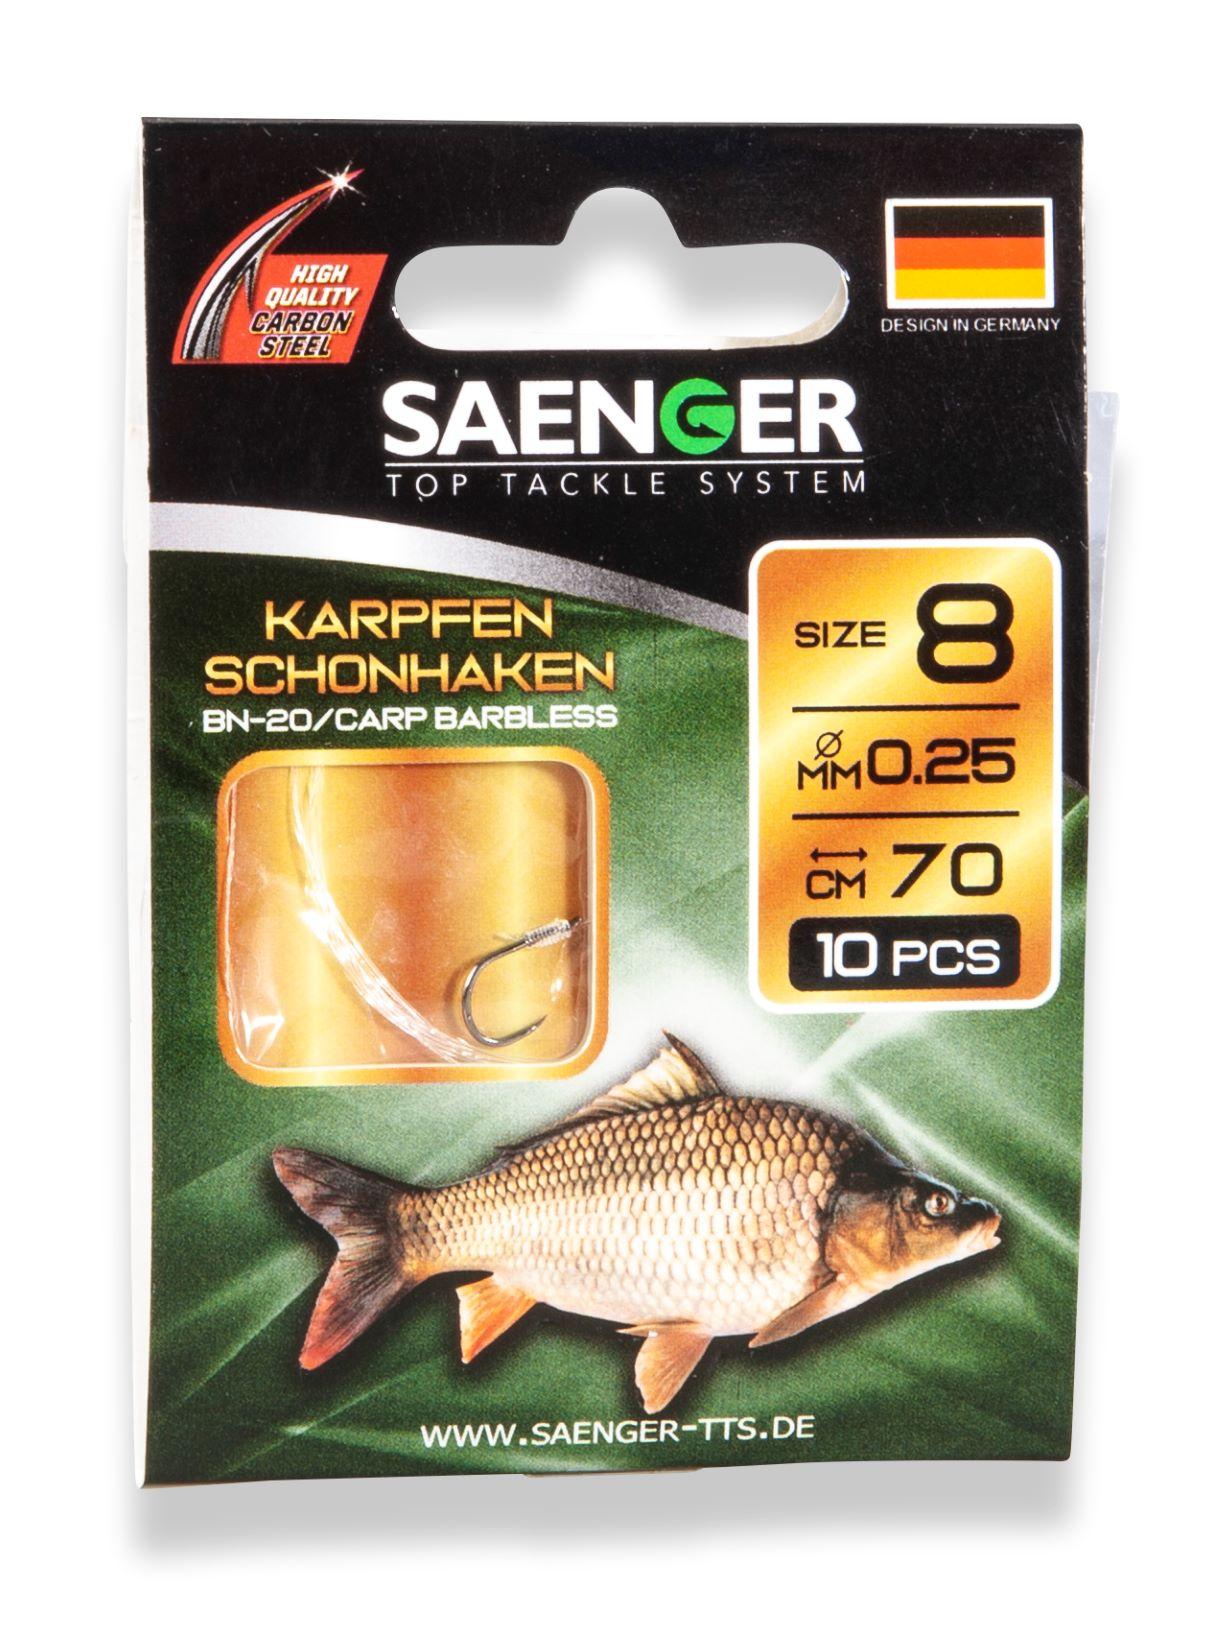 Saenger Návazec na kapry bezprotihrotý Karpfen Schonhaken vel. 4, 10 ks/bal